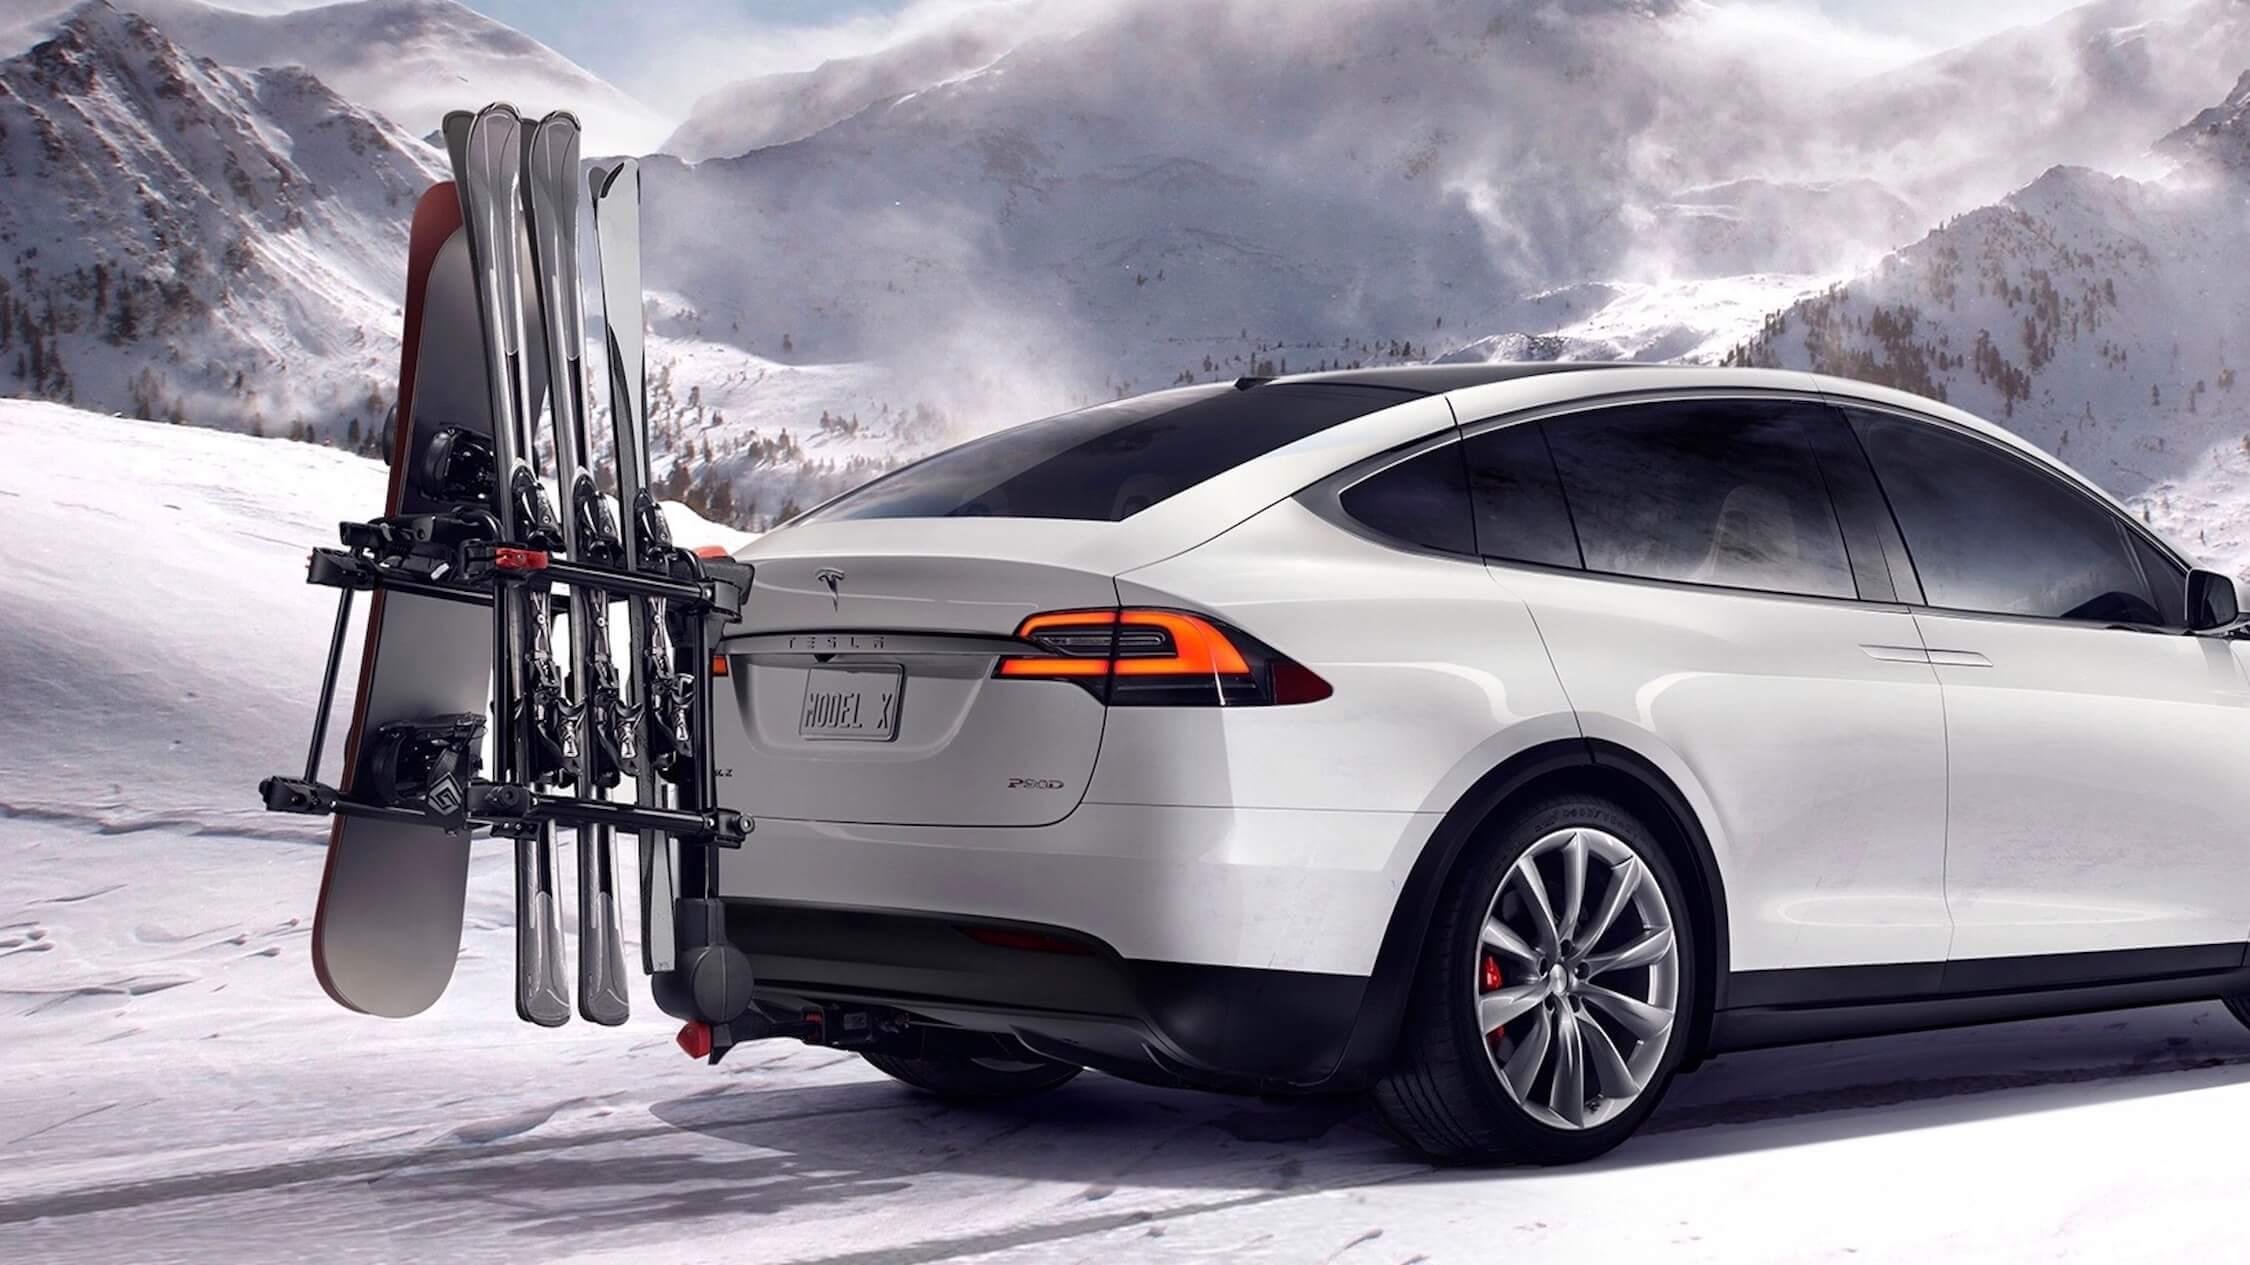 Tesla Model X ski dragers